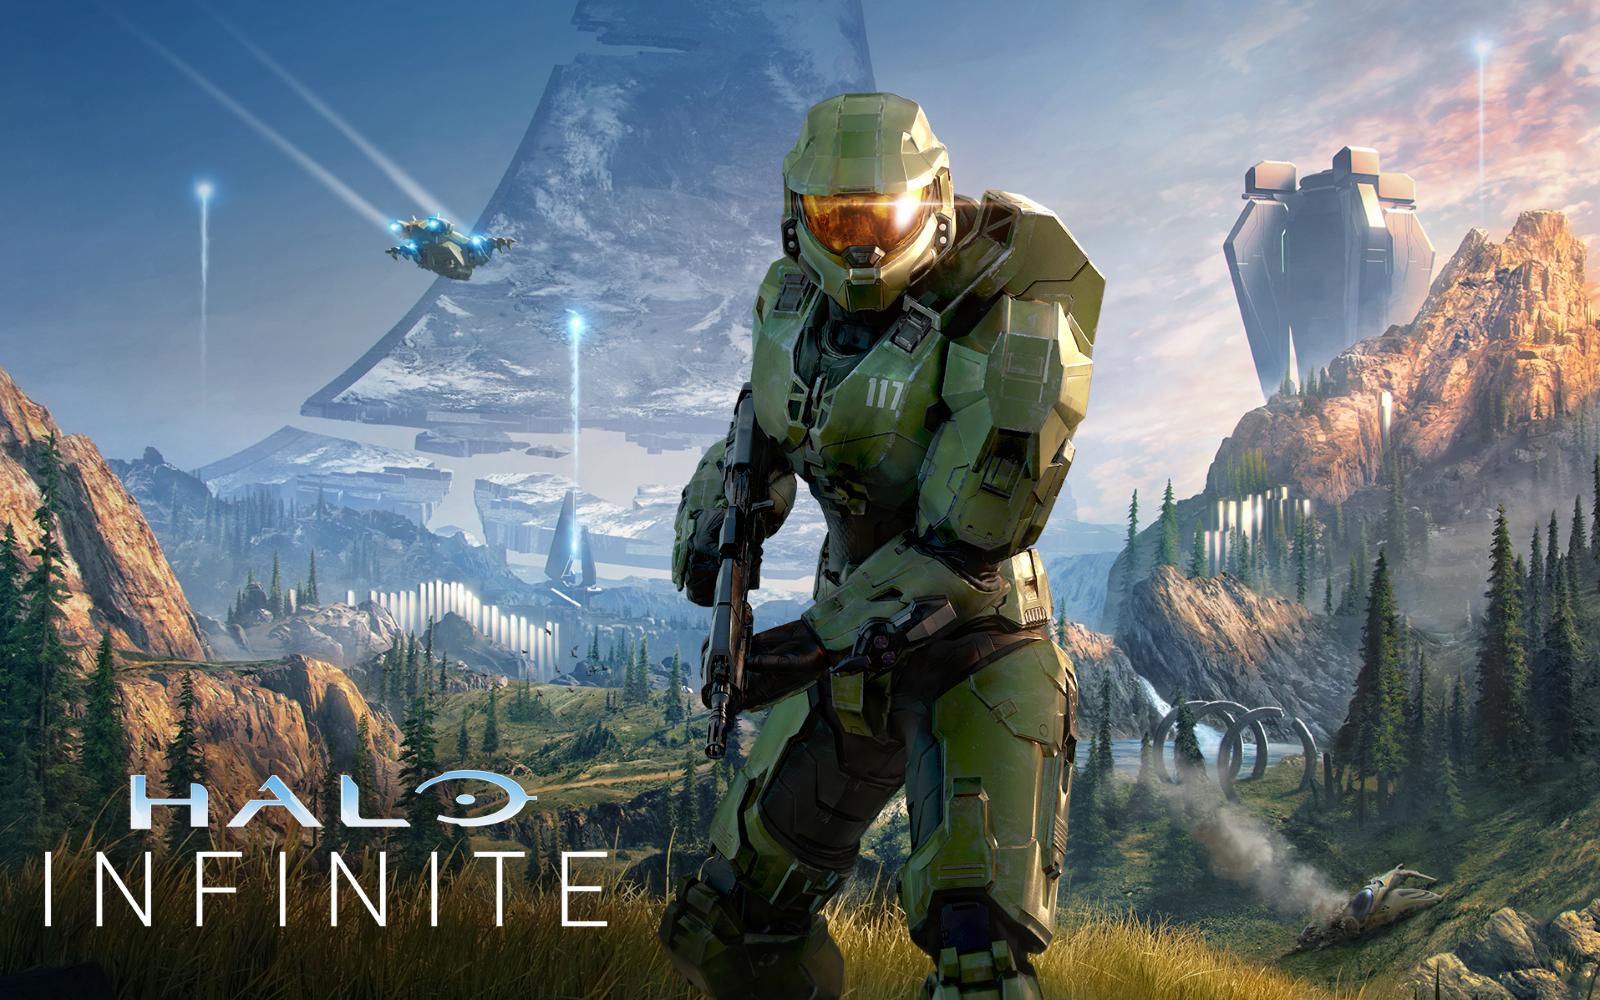 Halo Infinite Gameplay Revealed